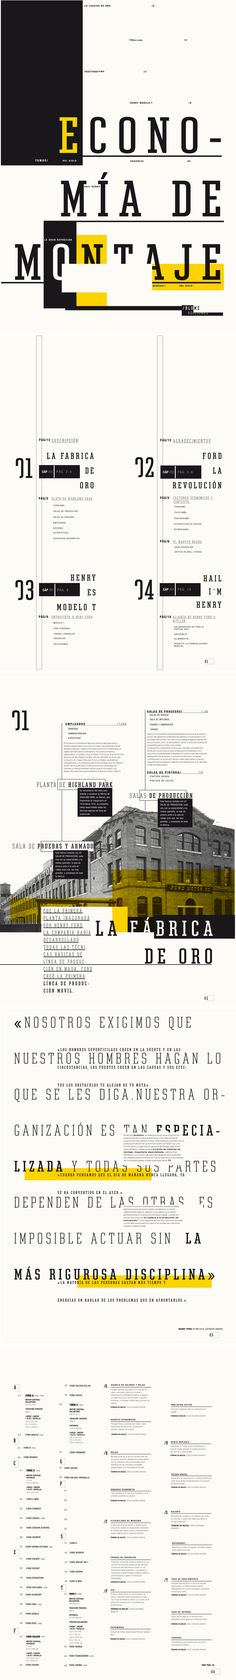 Editorial - Economia by M. Belen Garcia, via Behance